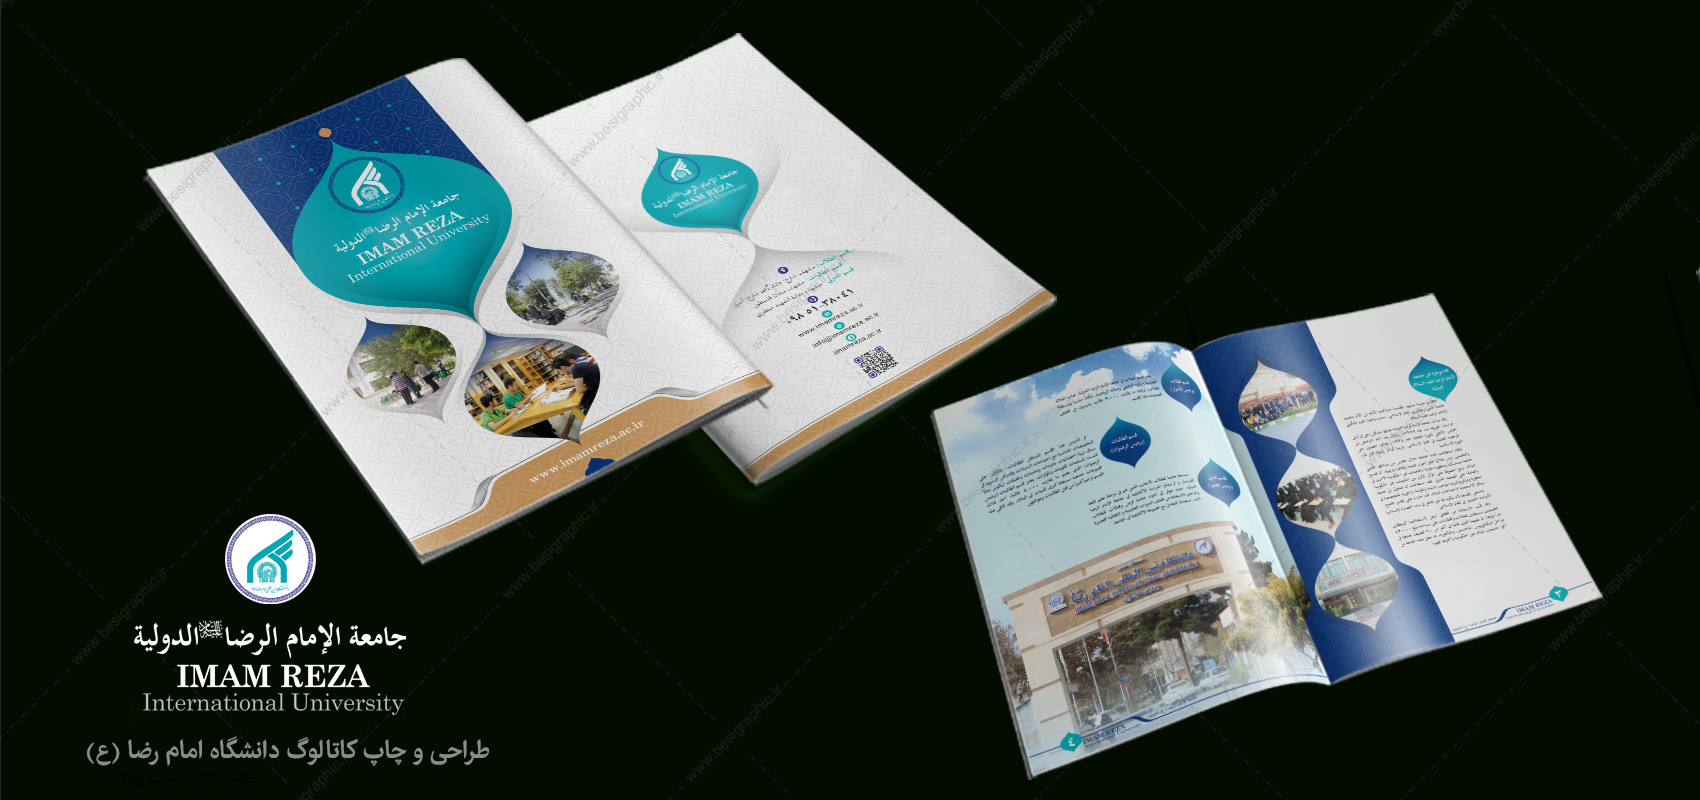 Catalog03 - طراحی کاتالوگ